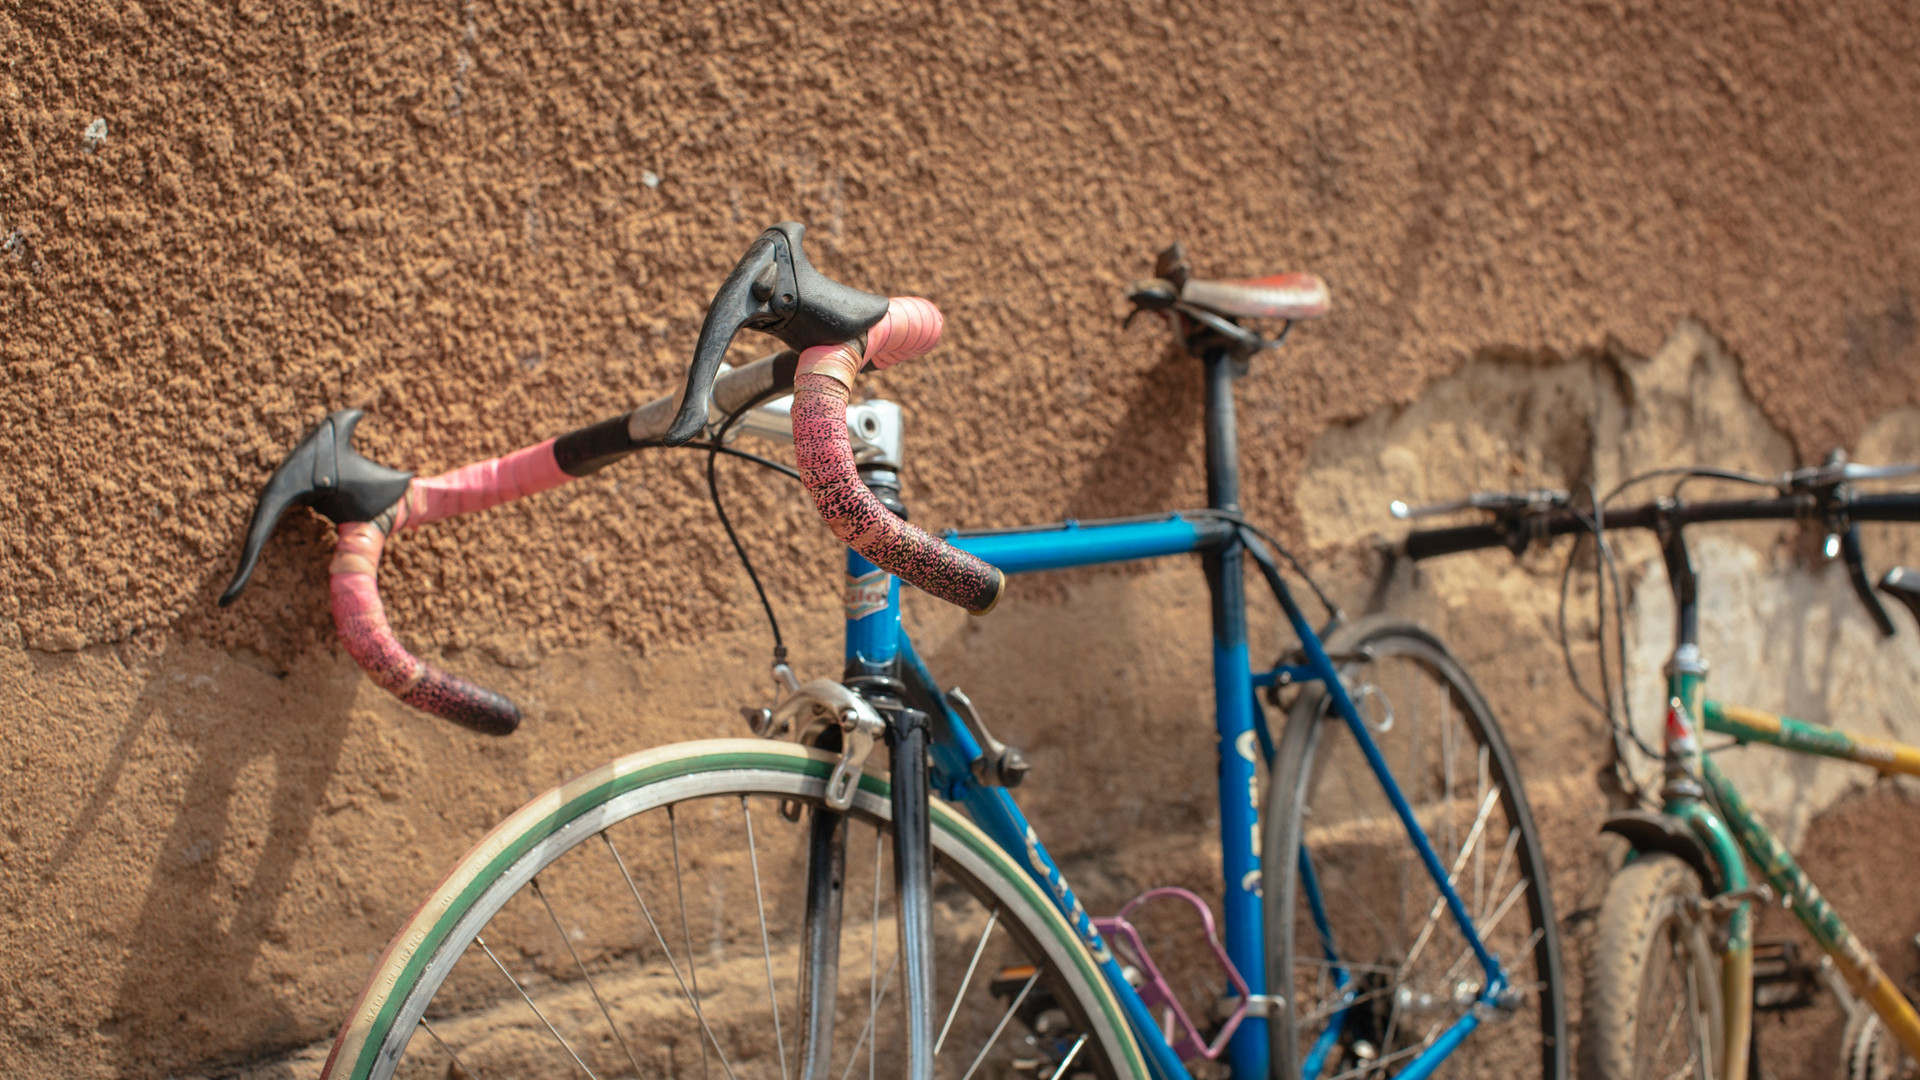 0194_Togo_KpaliméCyclingProject_20151220